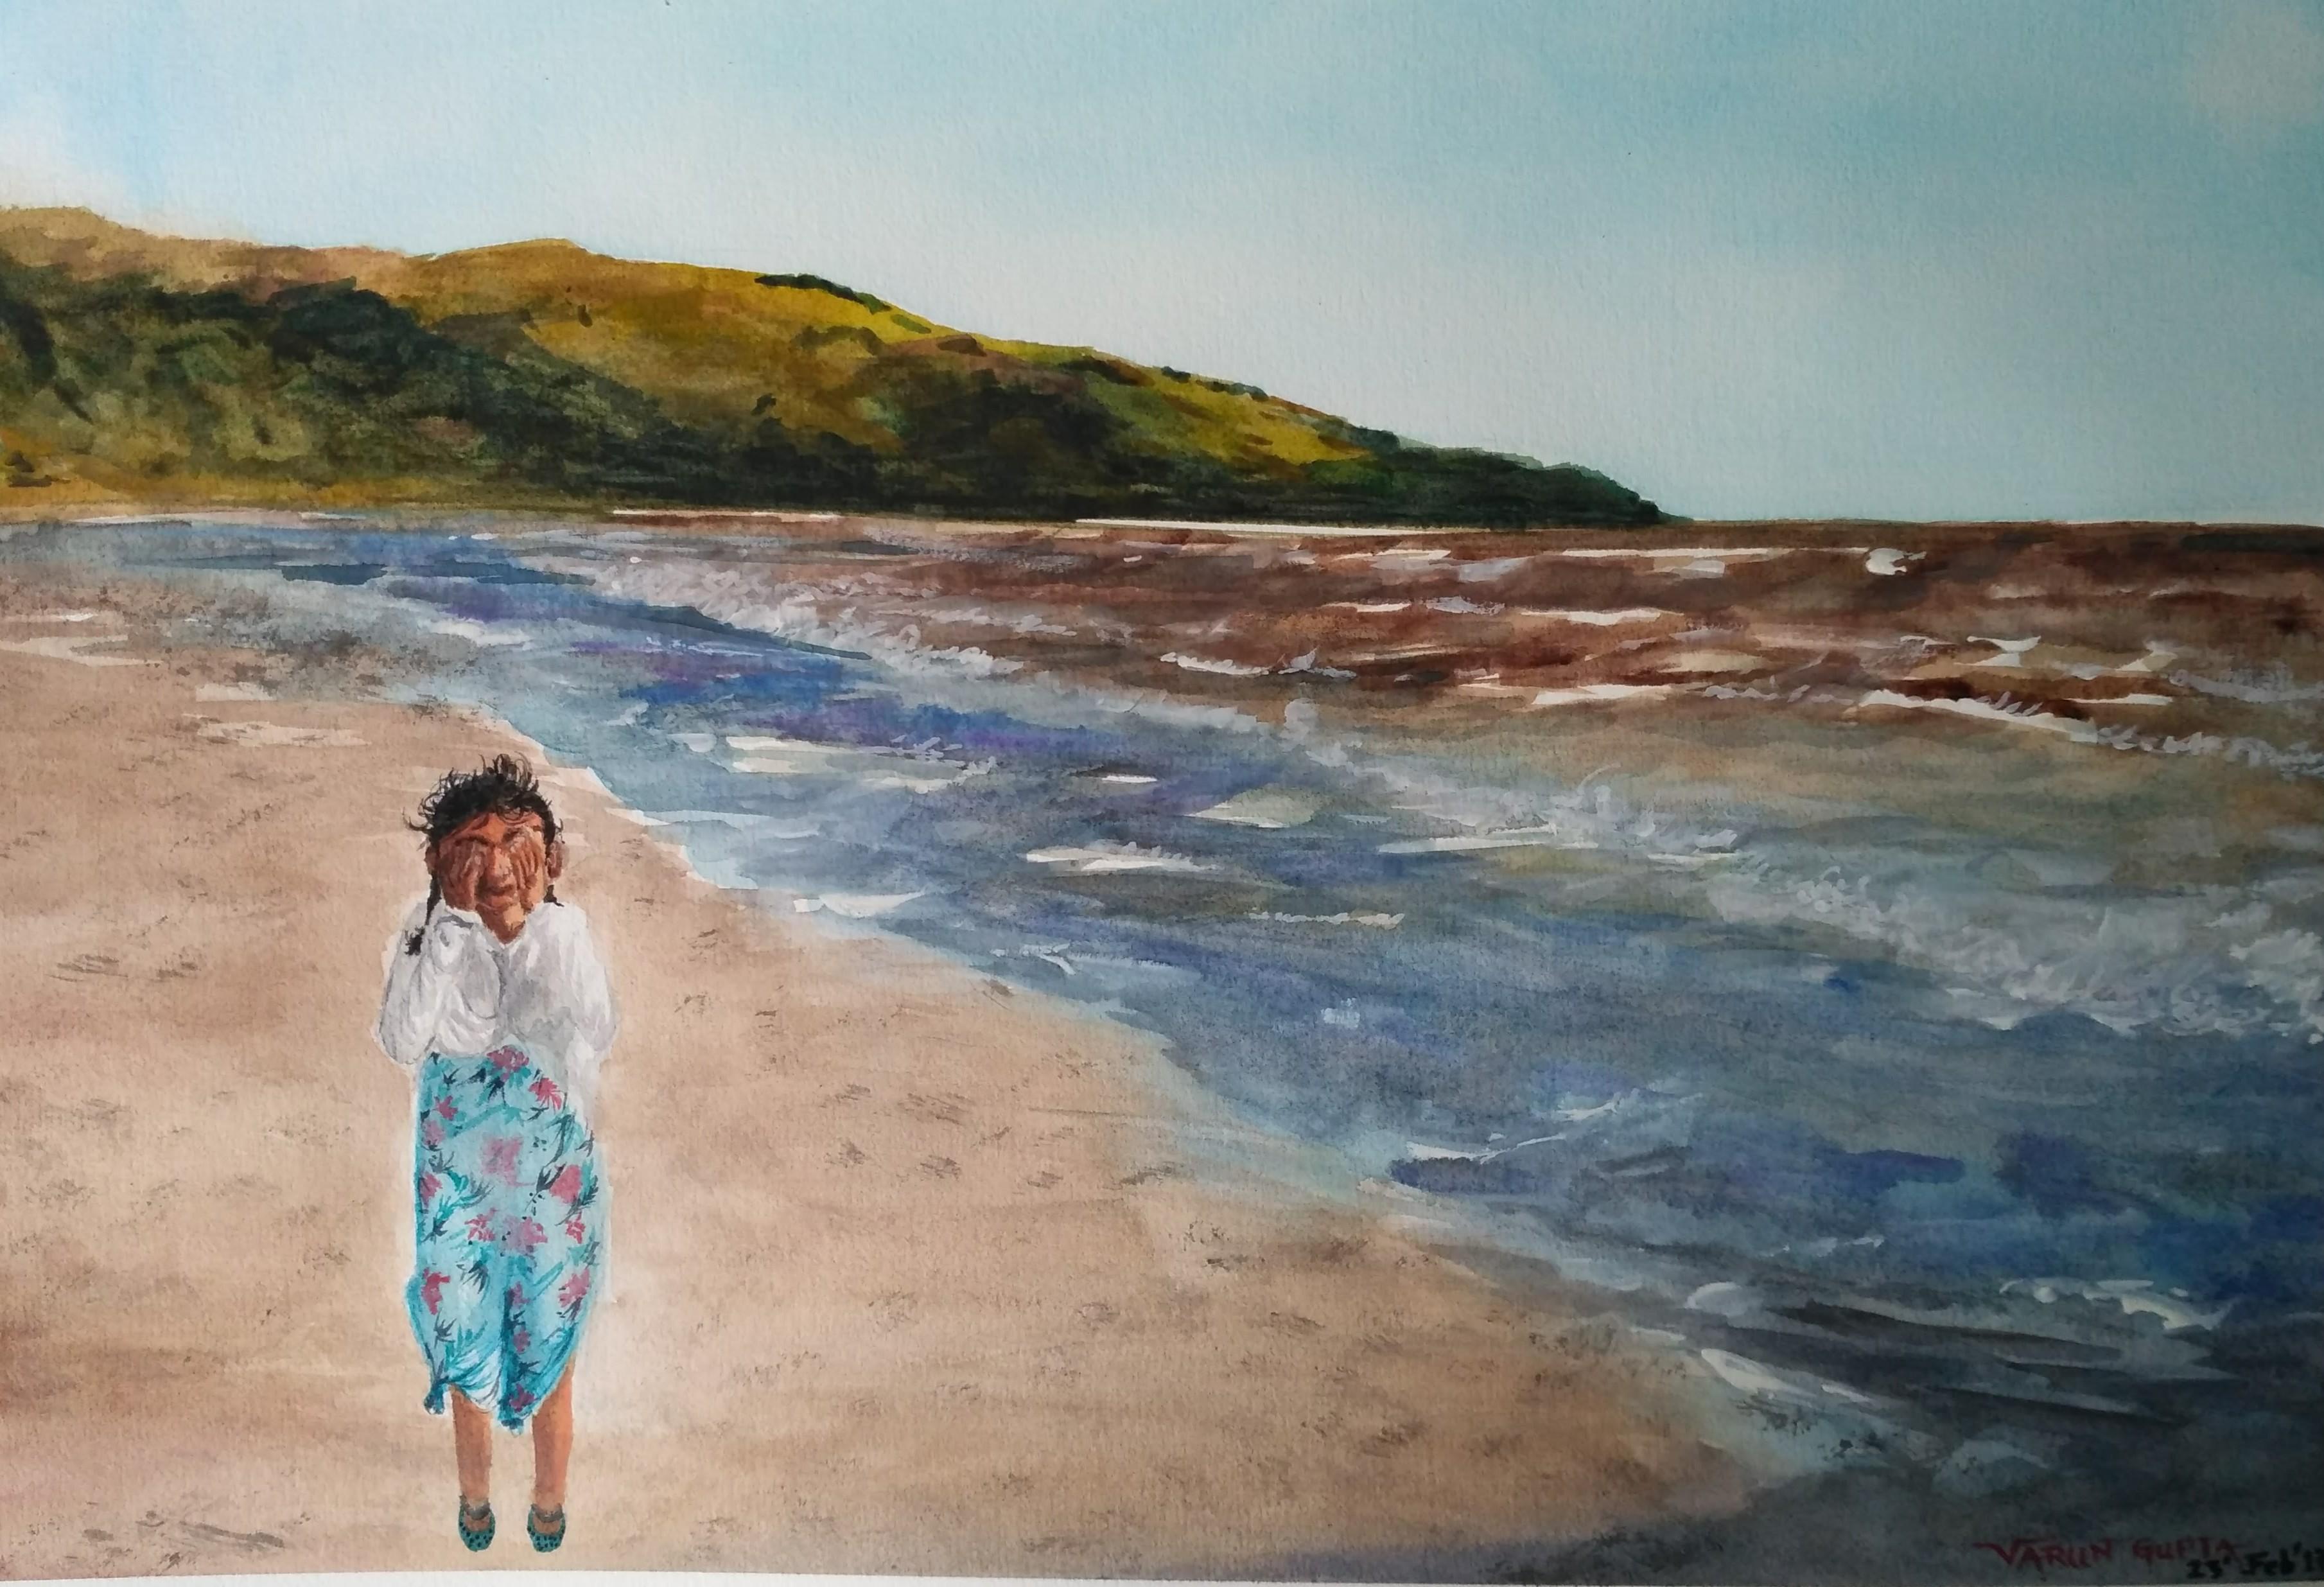 My love at shore - Paraparaumu Beach